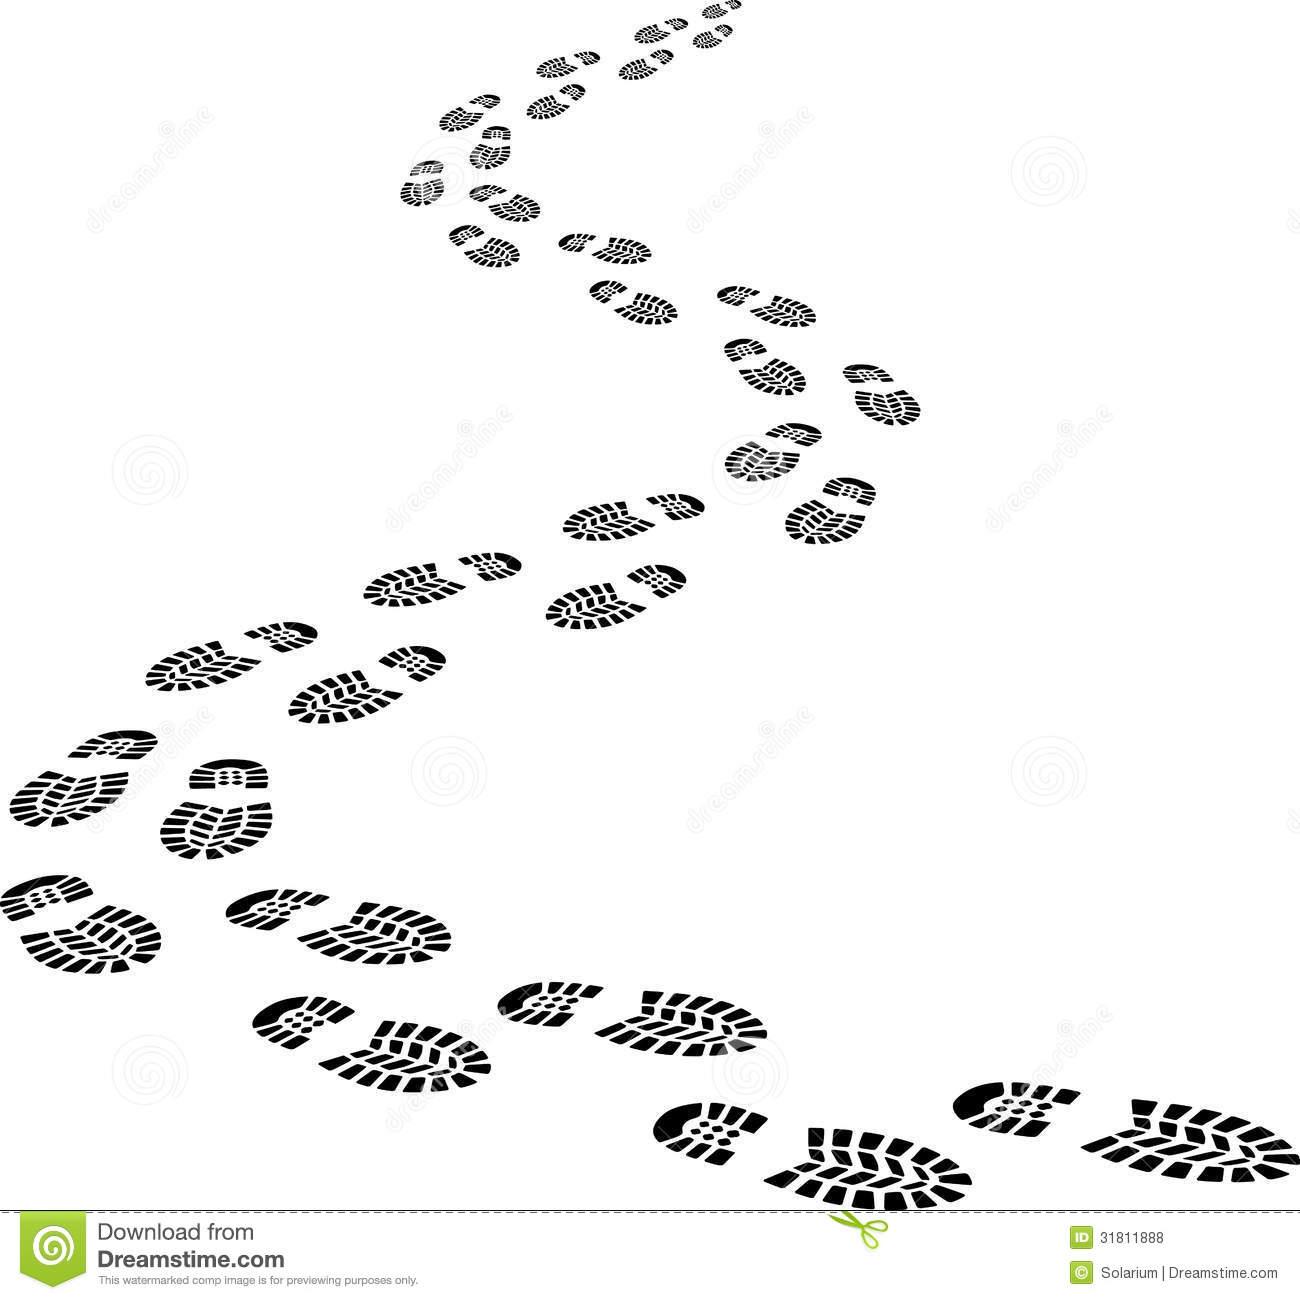 Footprints Free Clipart .-Footprints Free Clipart .-10